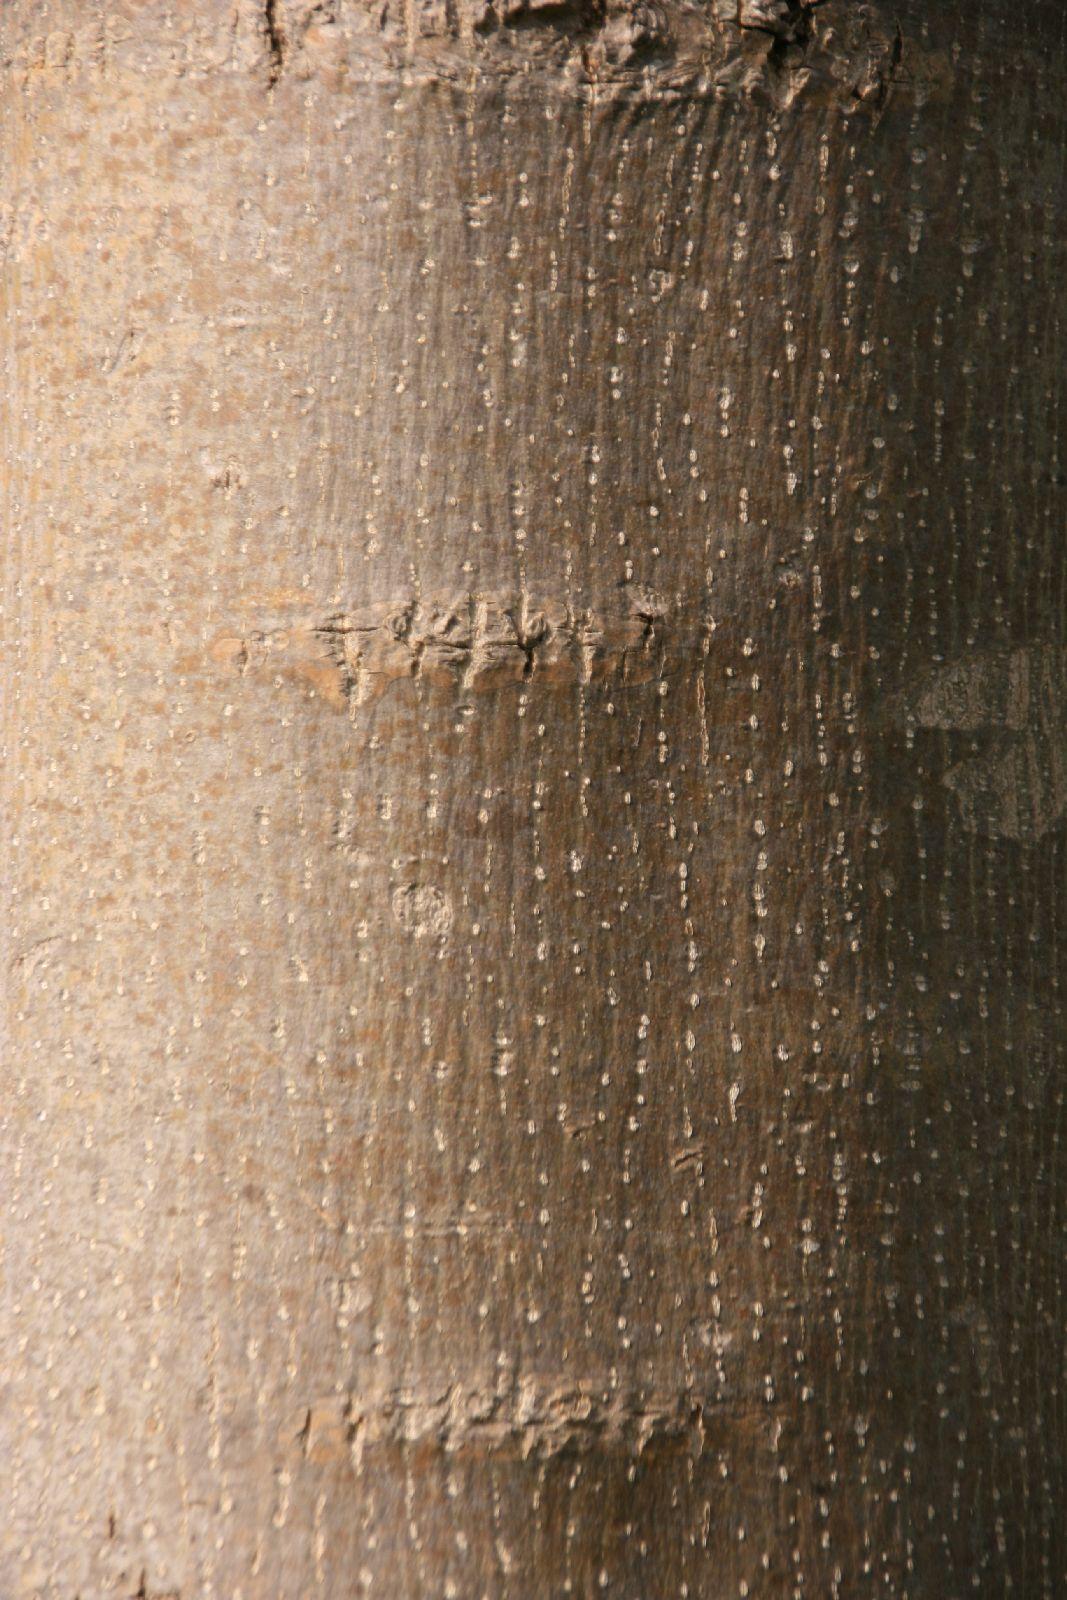 Baum-Rinde_Textur_A_MG_3532